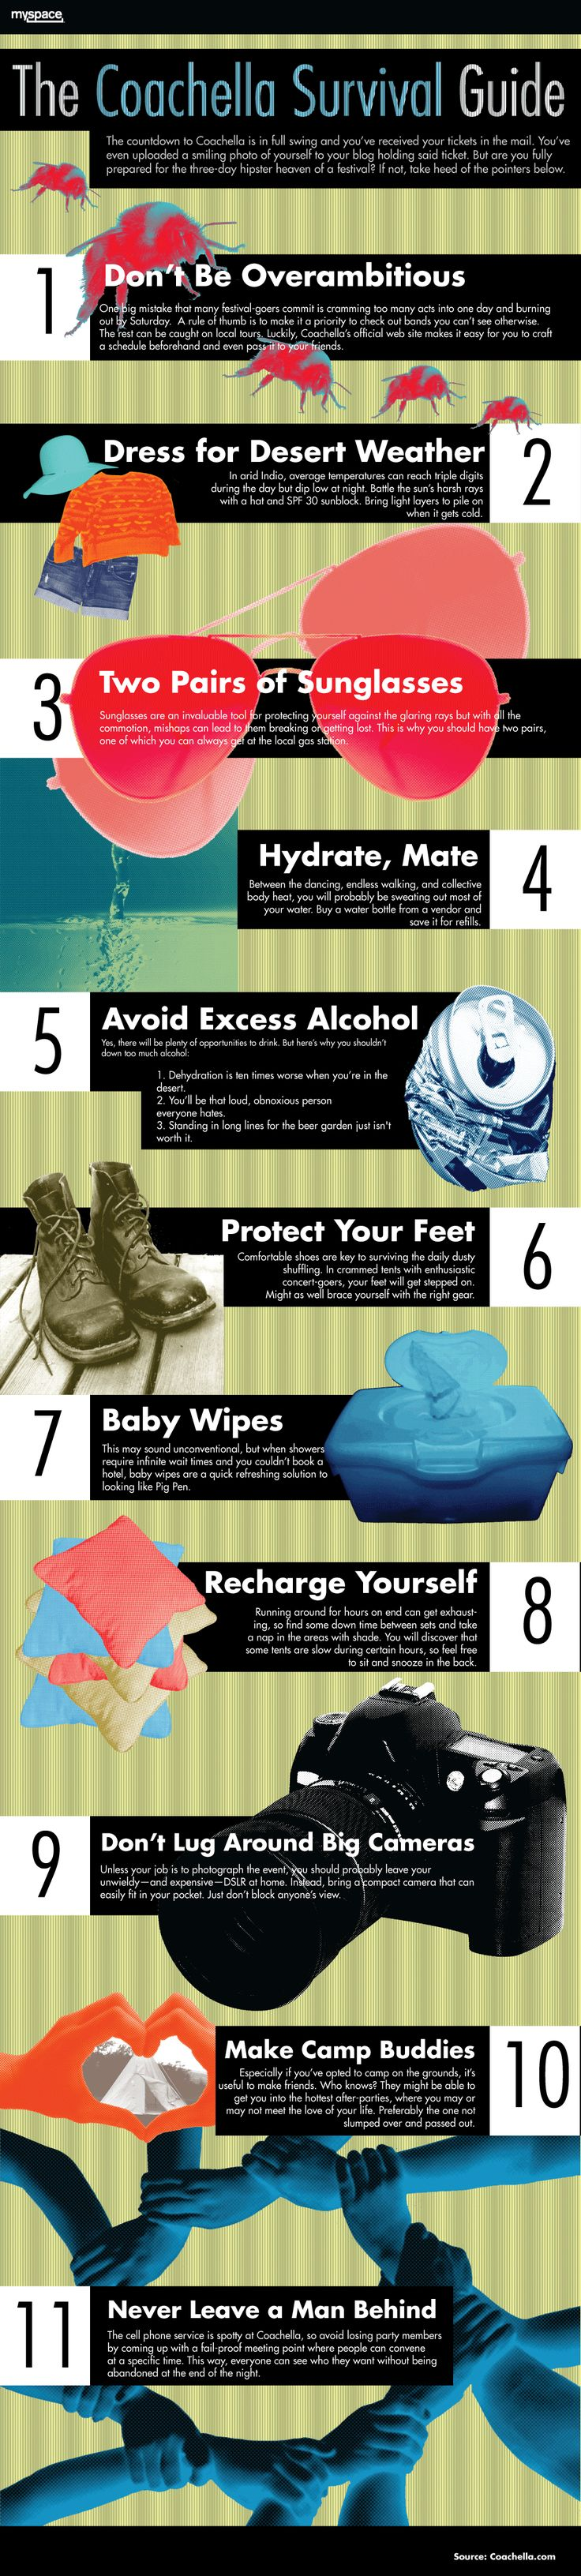 Coachella Survival Guide - Lolling.